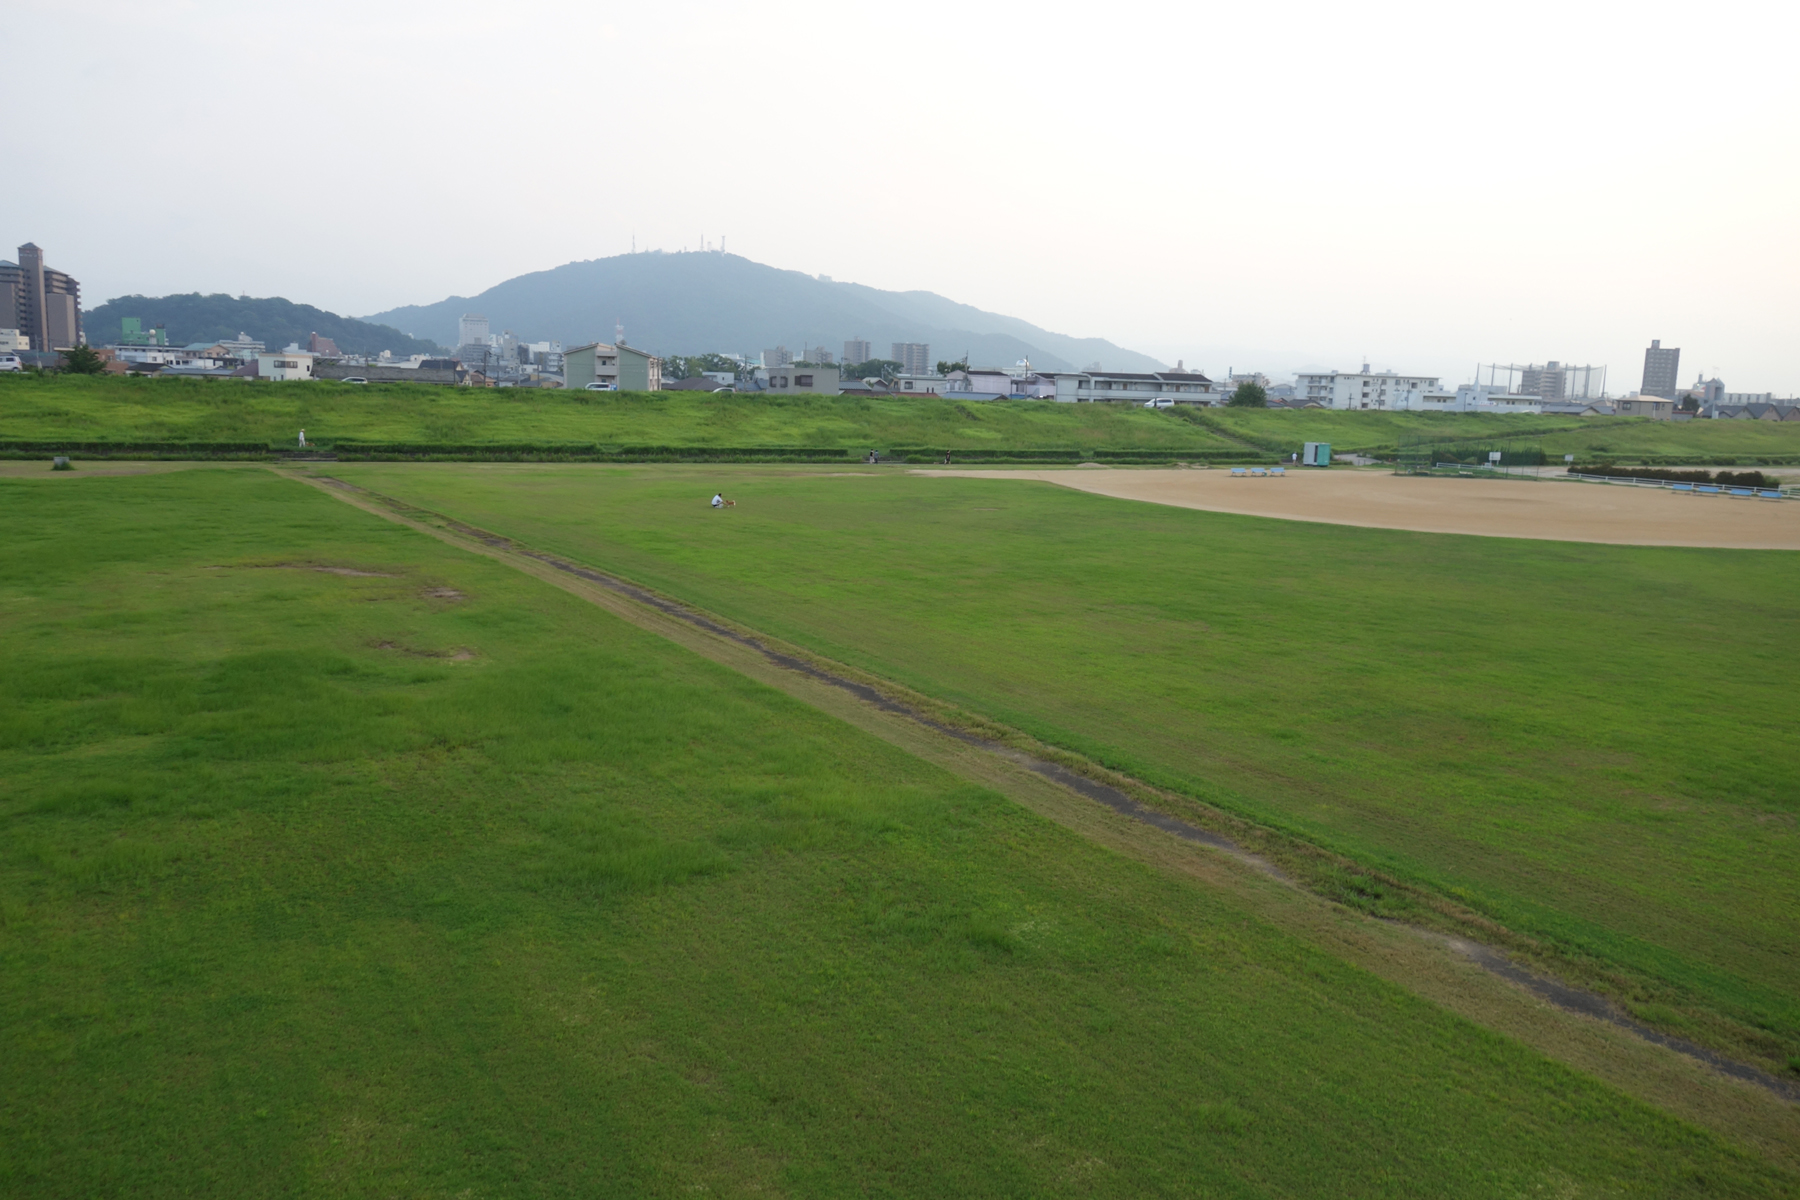 http://dplan-coltd.jp/sky/sample/1-DSC00163.JPG